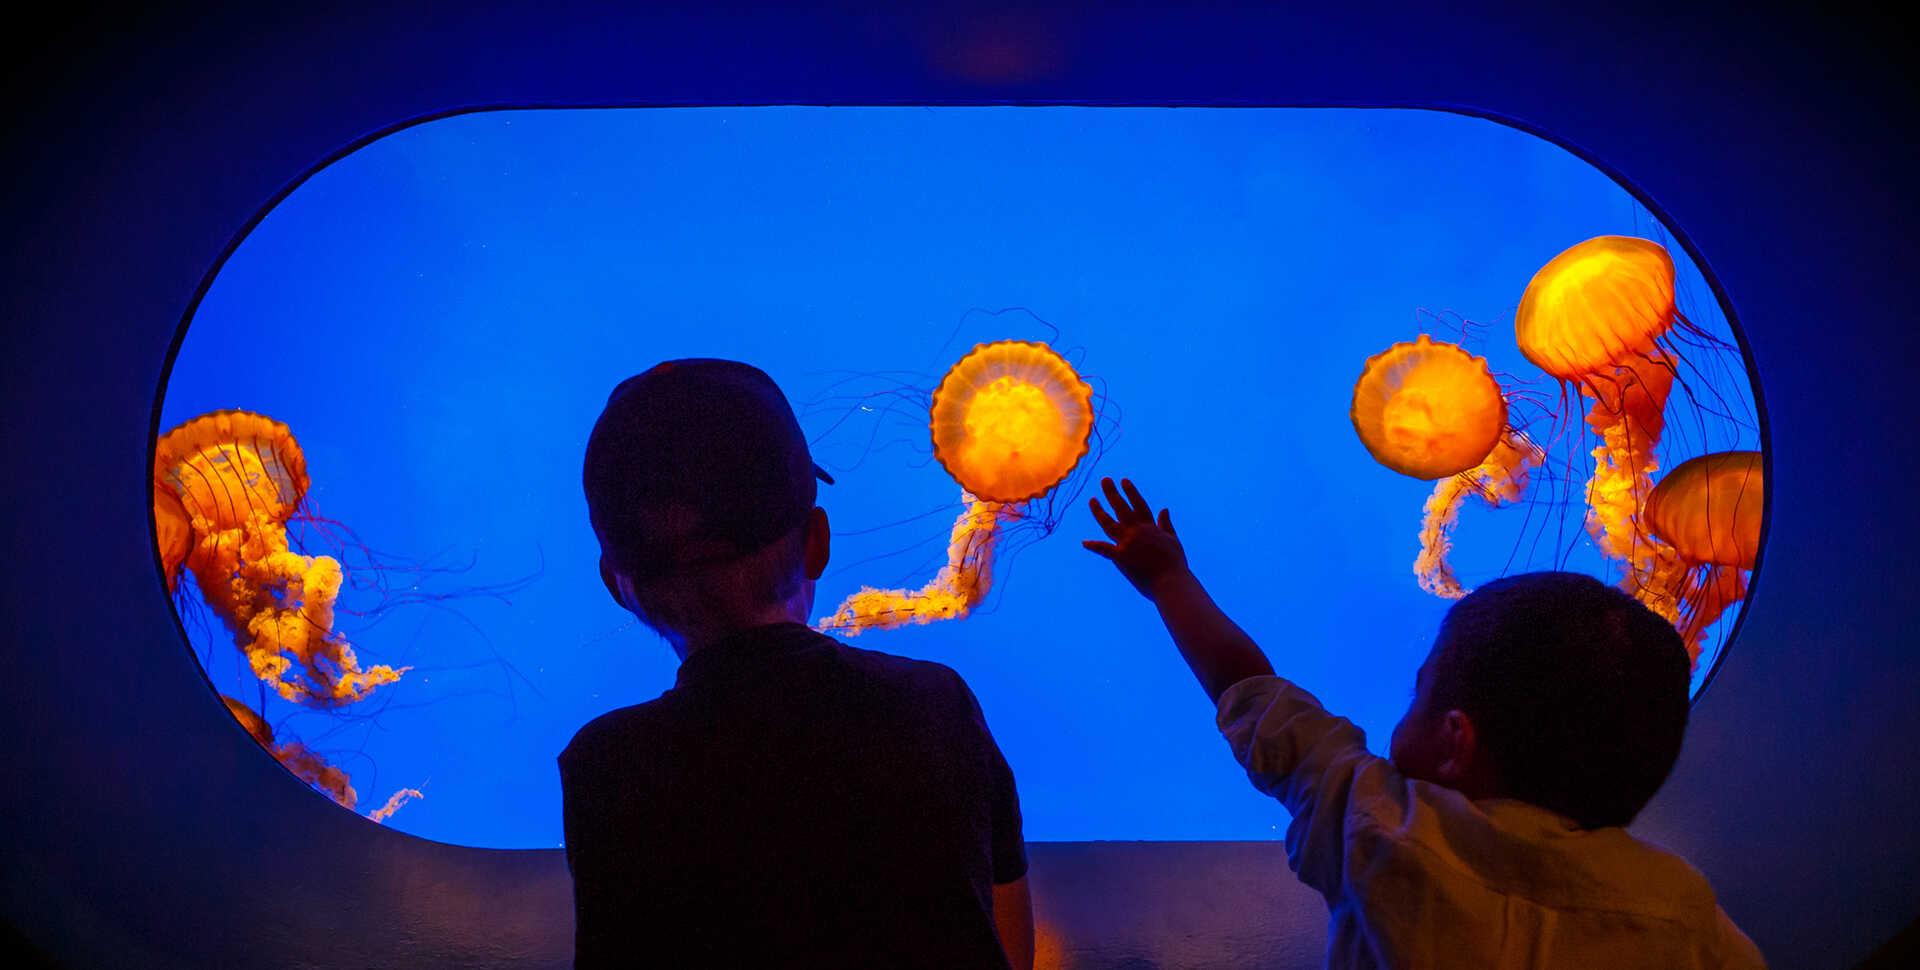 Beautiful sea nettle jellyfish exhibit glows orange as two boys stare in wonder